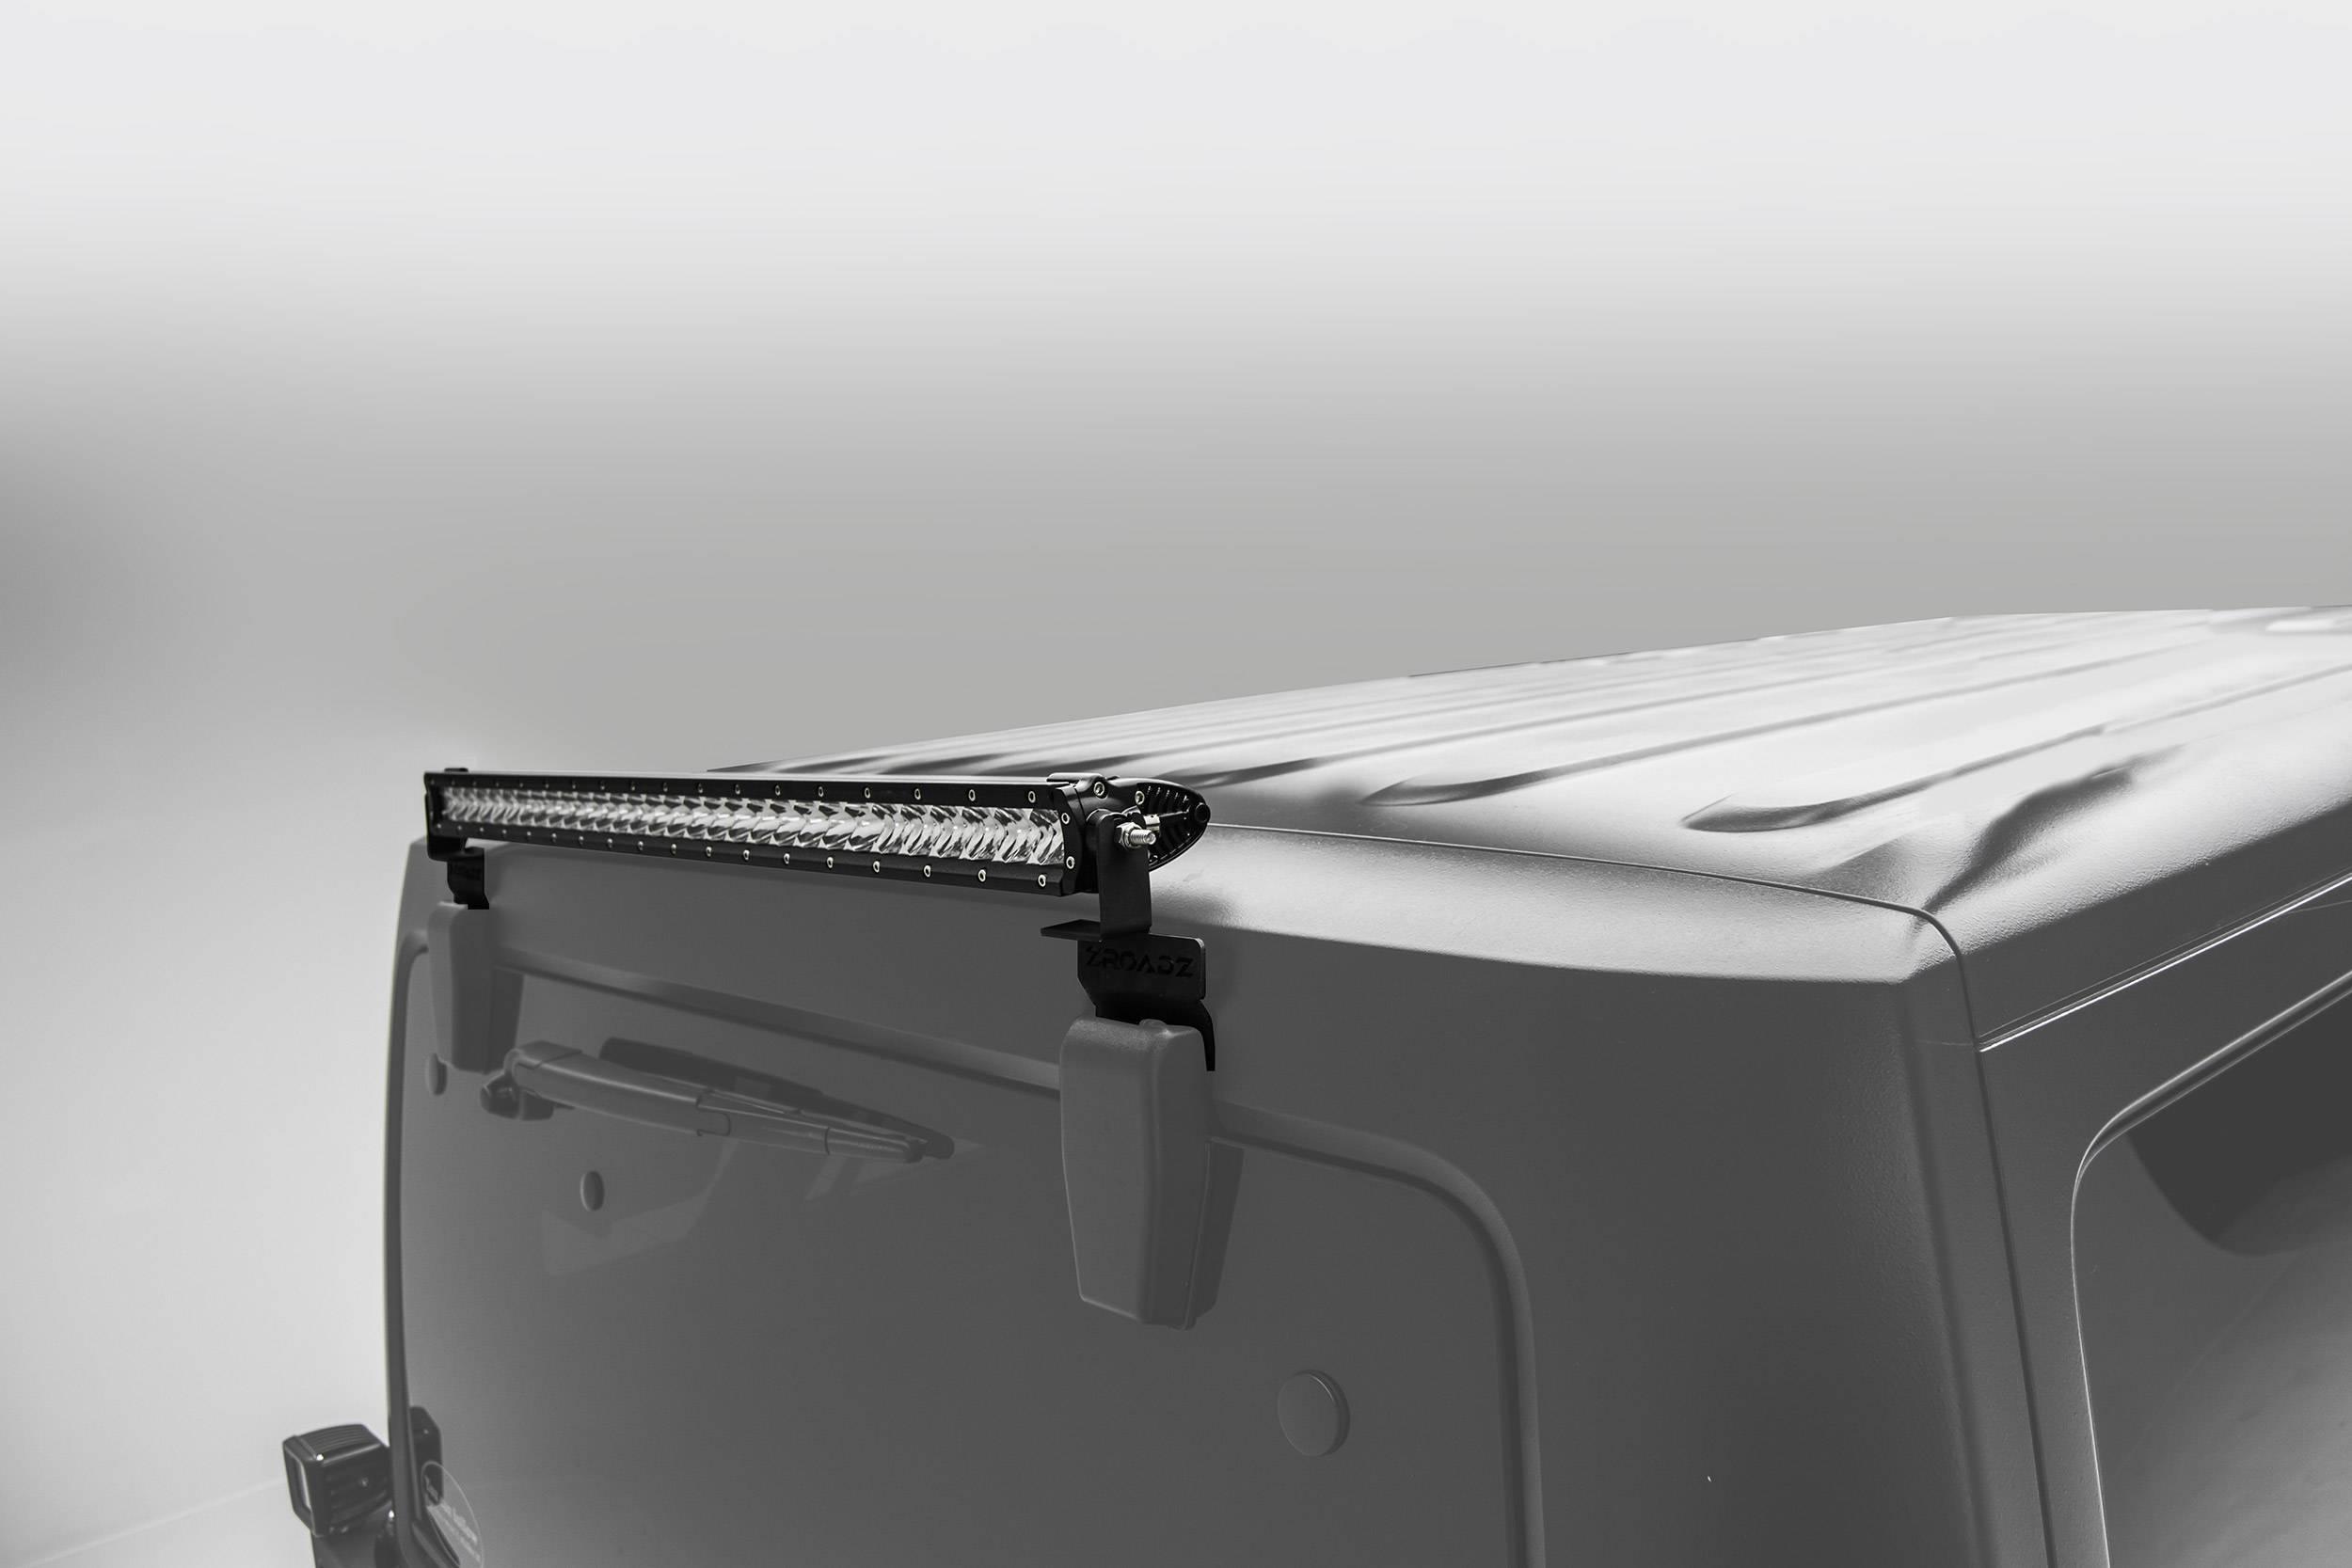 ZROADZ OFF ROAD PRODUCTS - 2007-2018 Jeep JK Rear Window LED Bracket to mount (1) 30 Inch Staight Single Row LED Light Bar - PN #Z394811